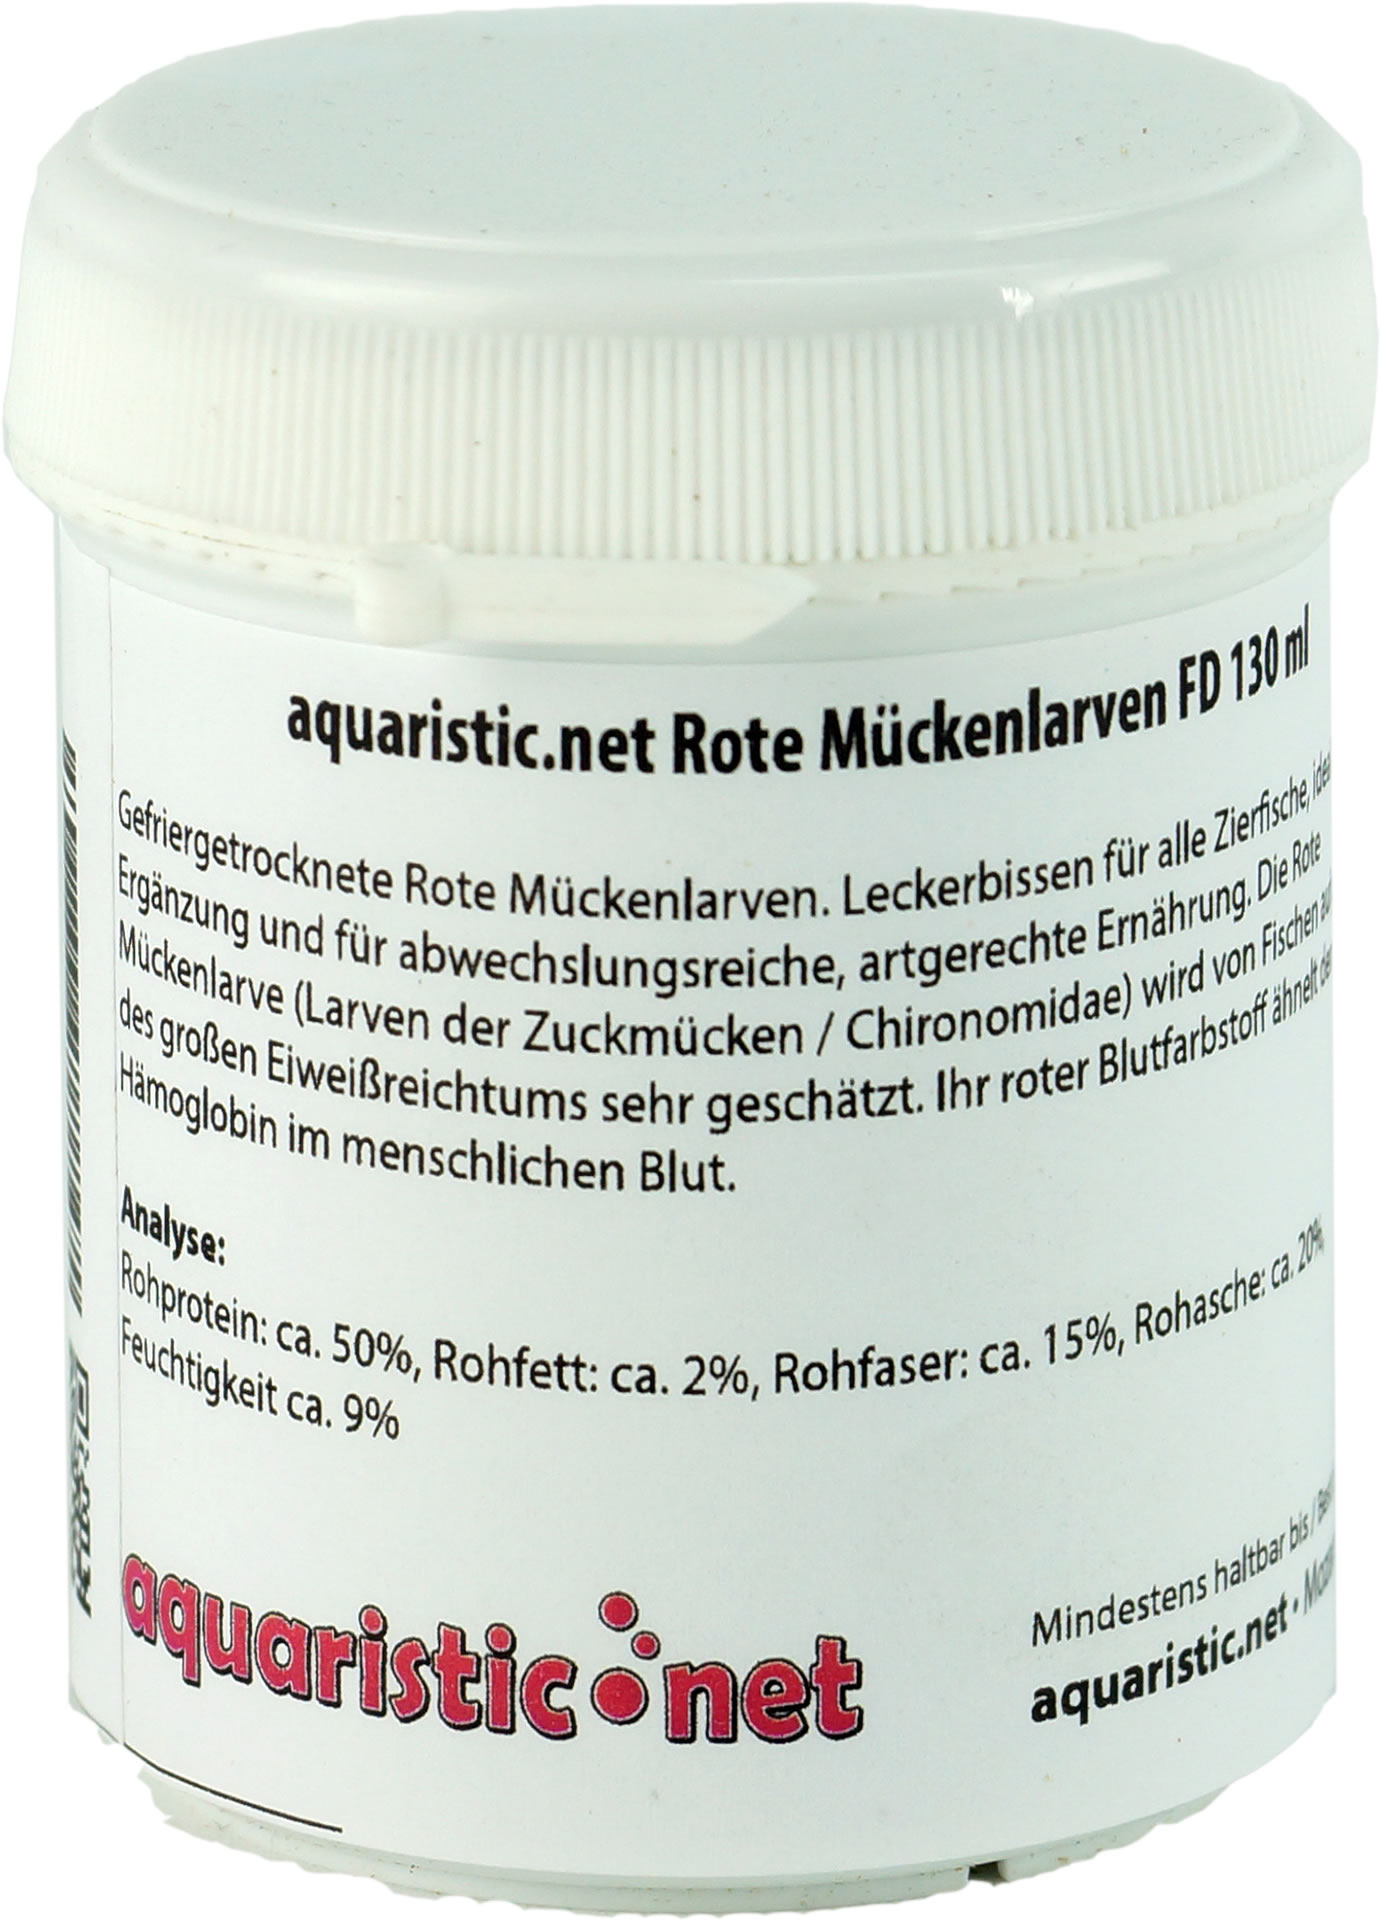 aquaristic.net Rote M�ckenlarven FD